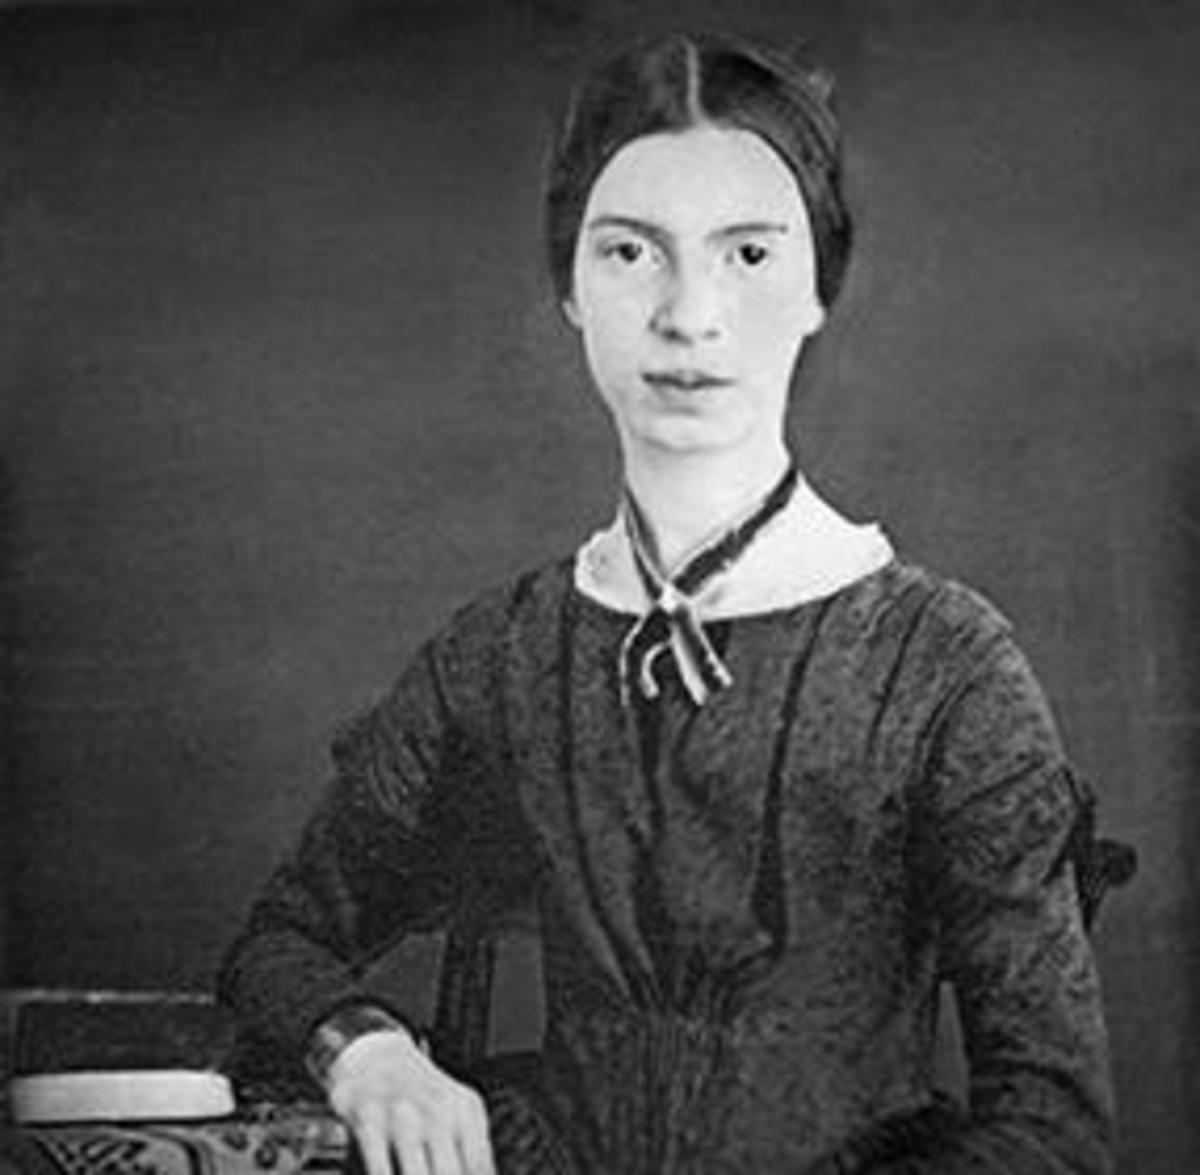 Analysis of Emily Dickinson's Poem